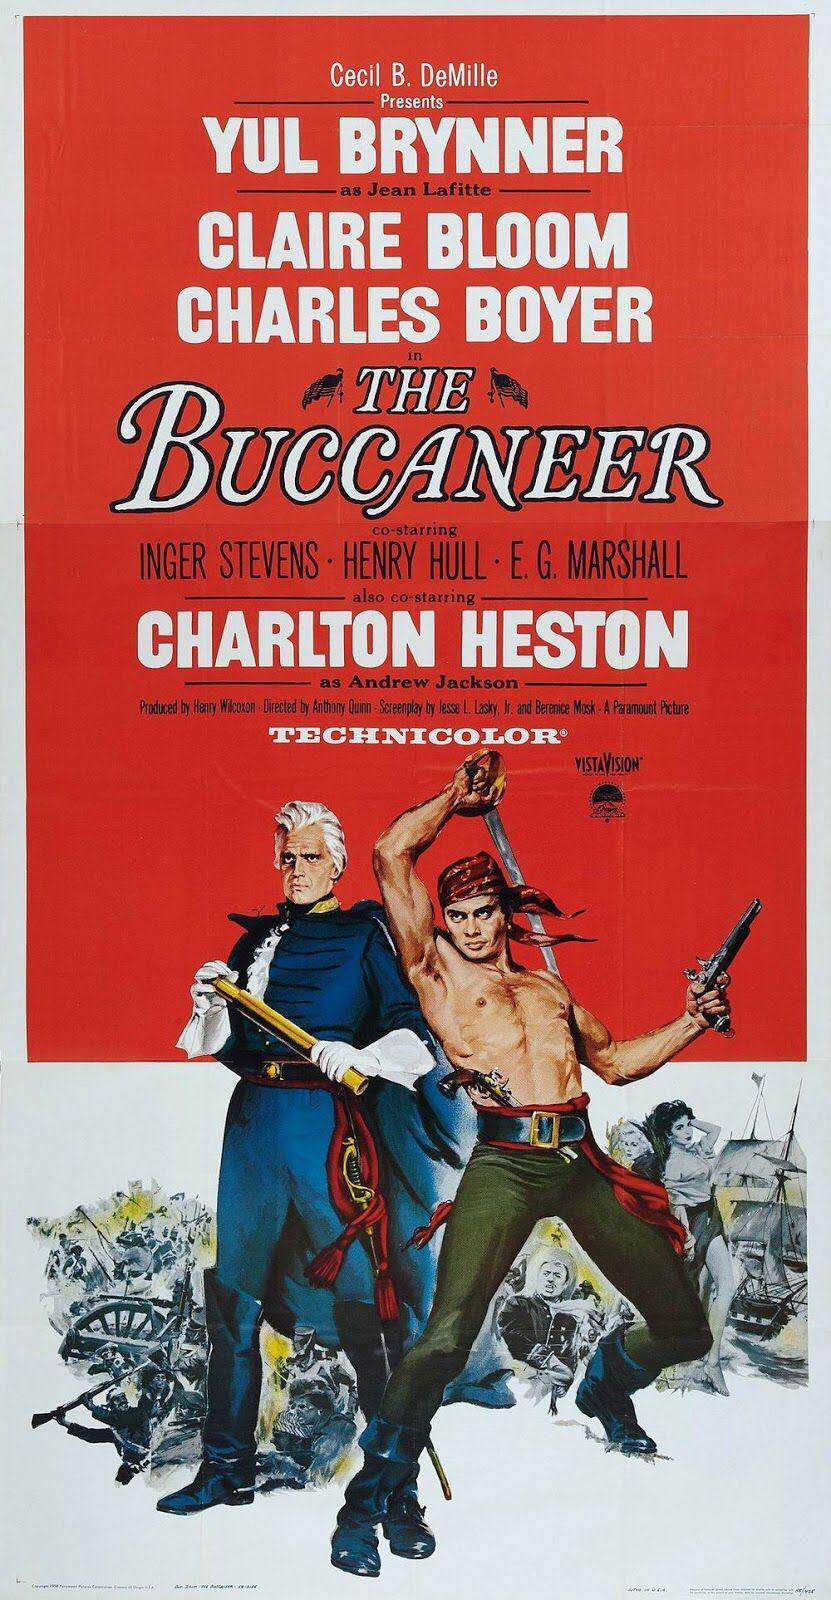 Pin by Virginia Armistead on Charlton Heston Movie